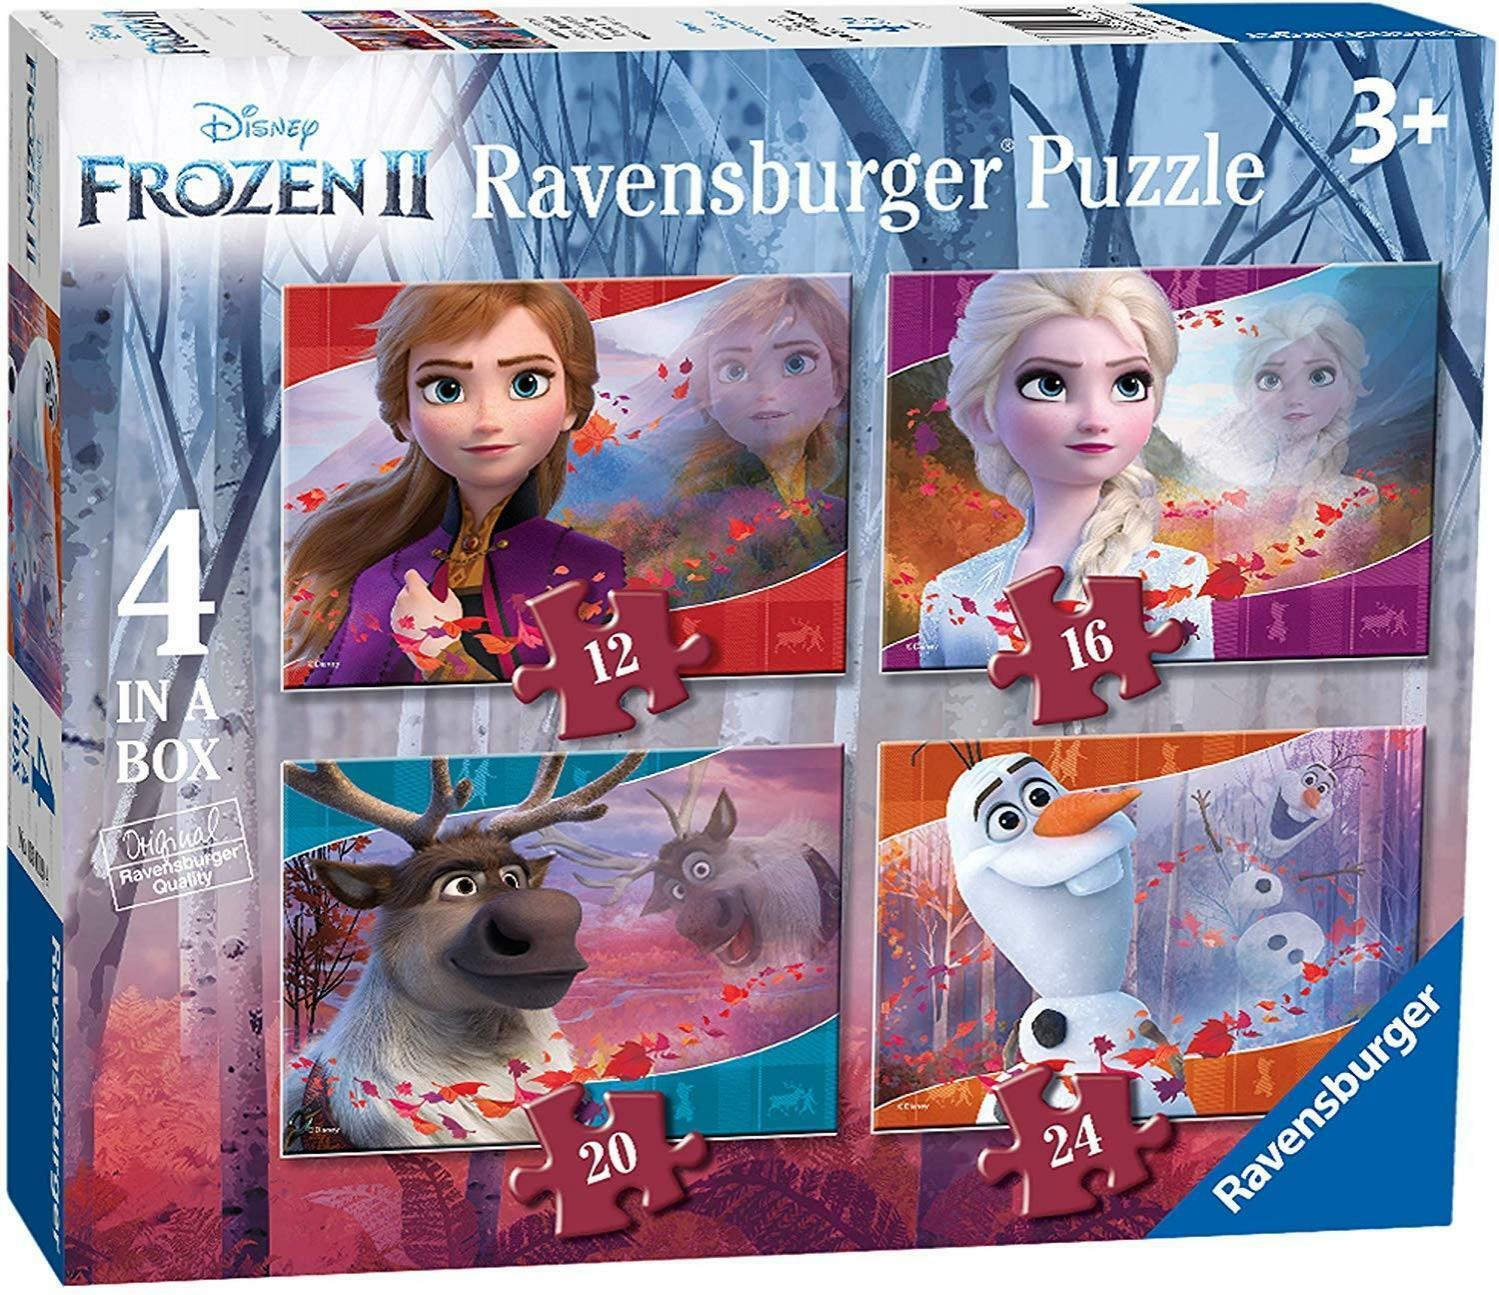 ravensburger ravensburger frozen 2 puzzle 4 in a box 03019